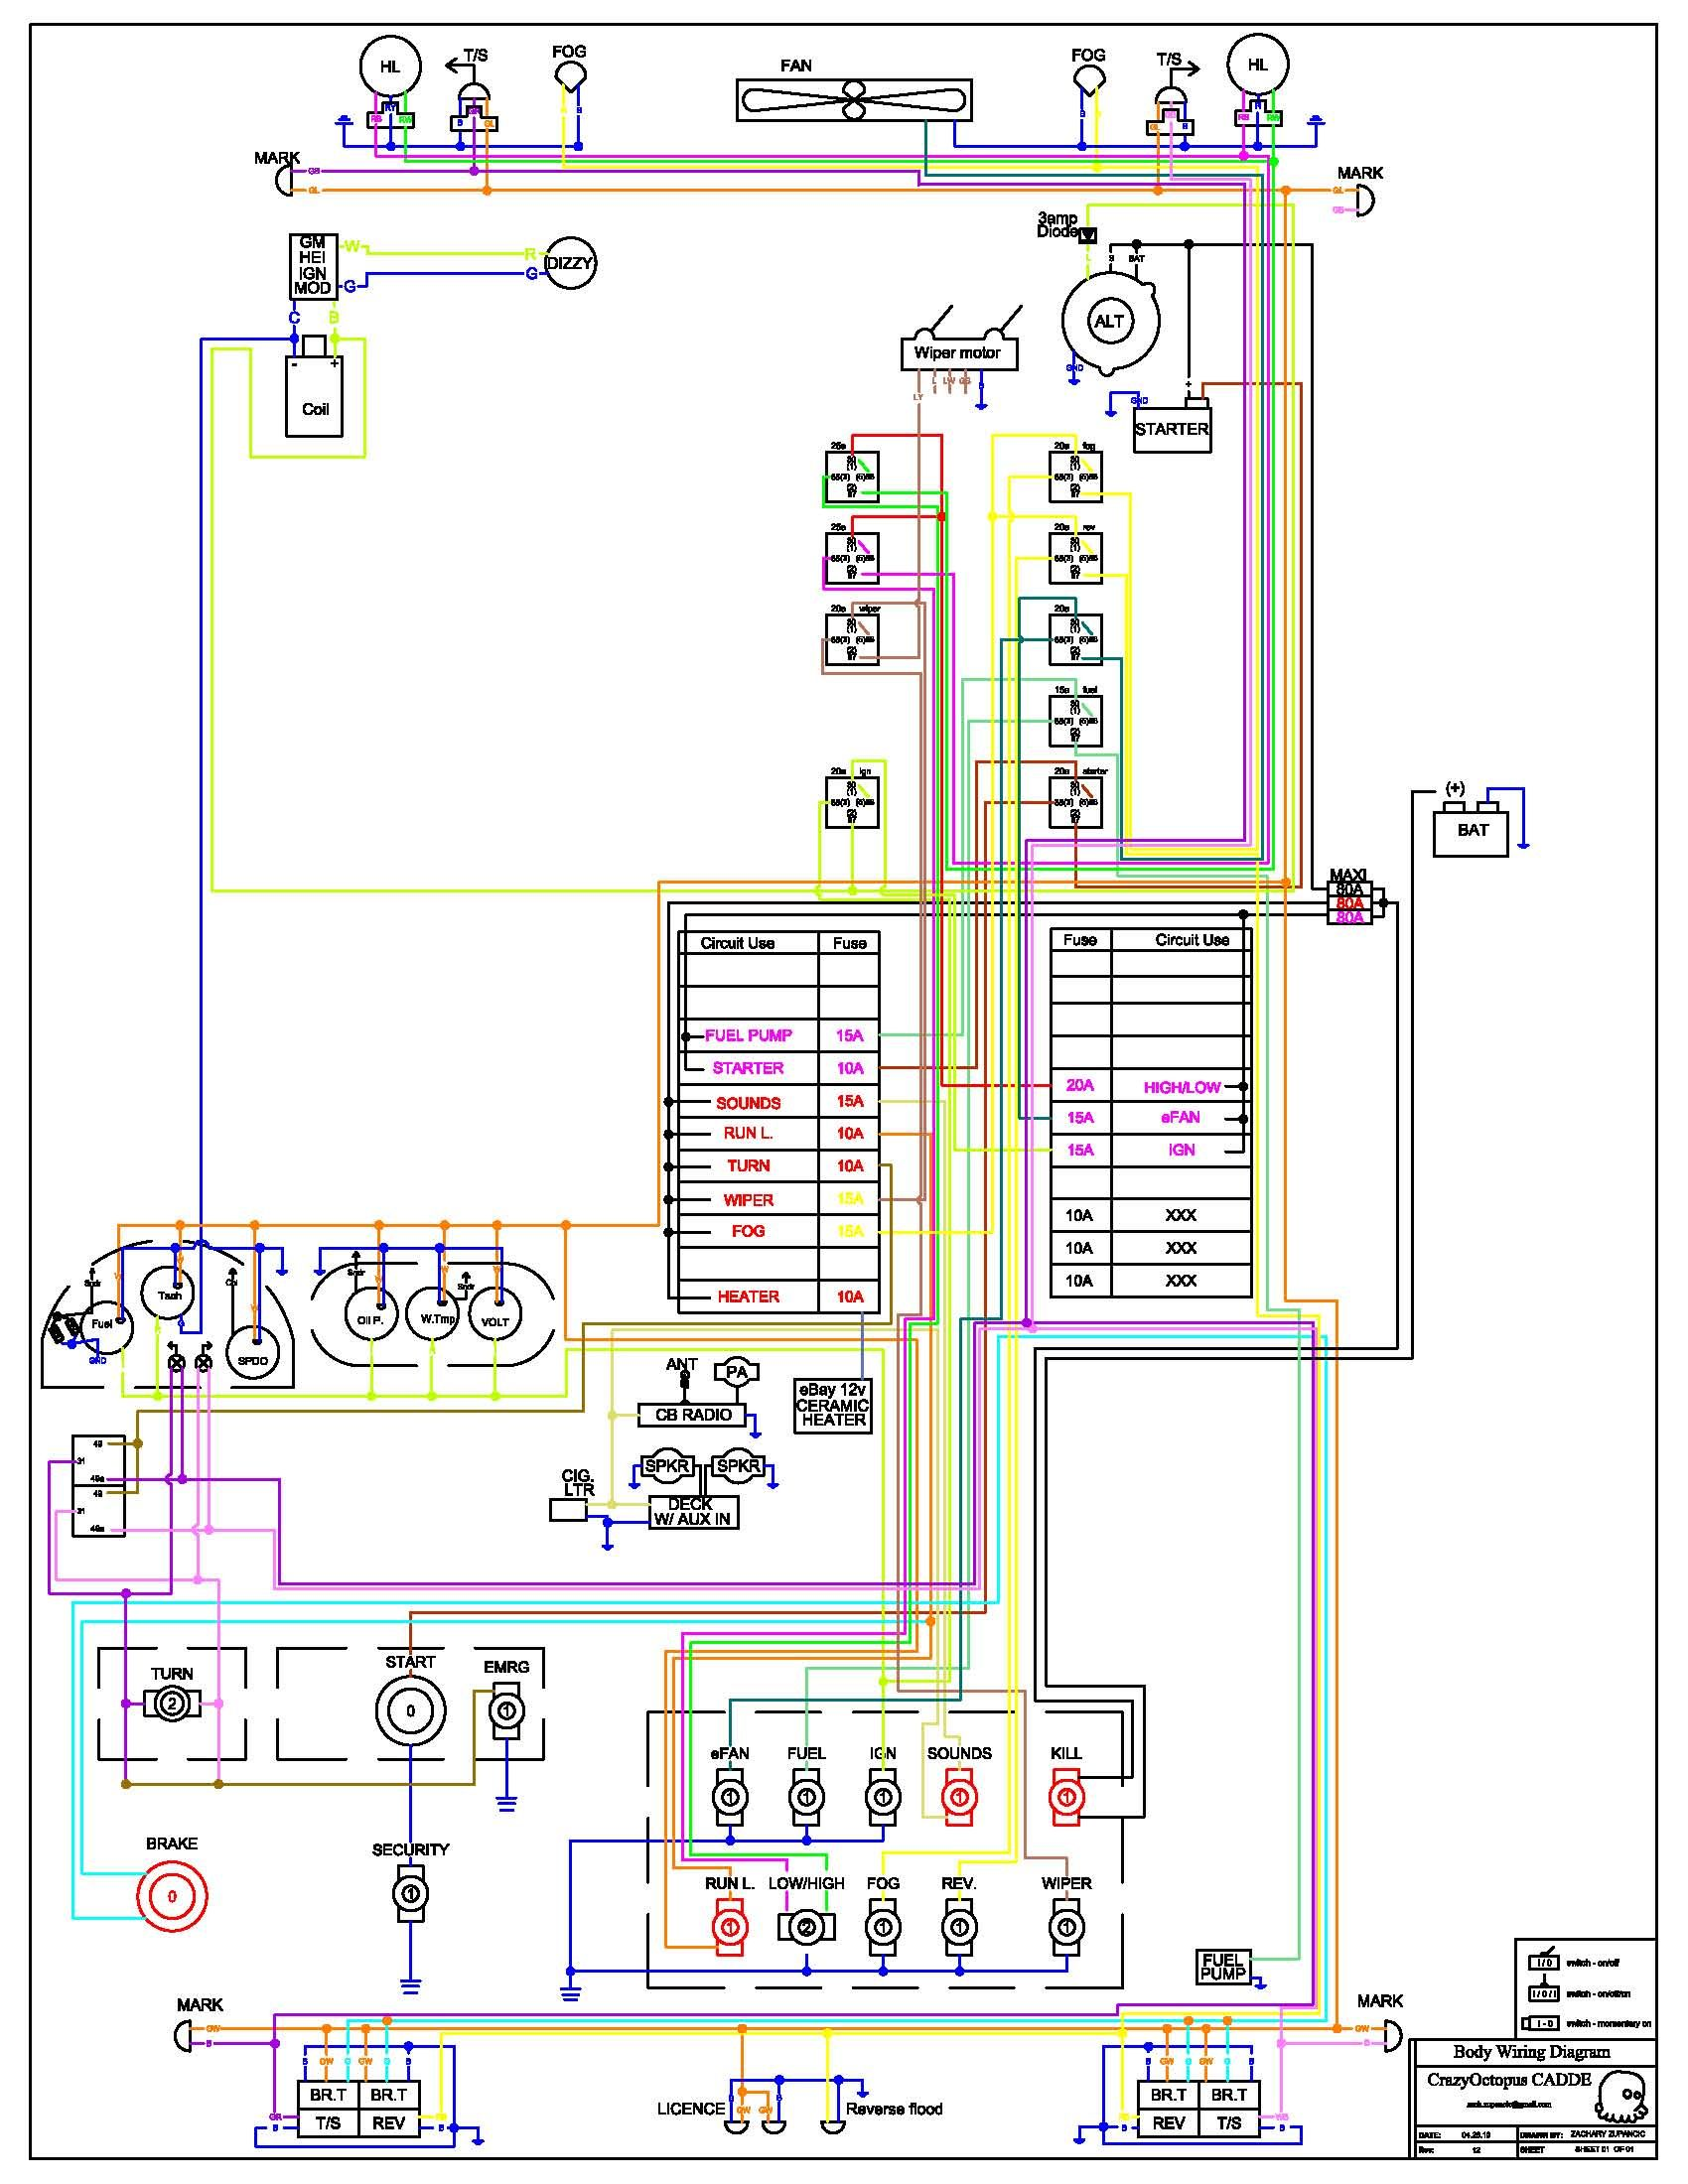 Wiring Diagram Slot Car Track | Advanced Wiring Slot Car Track |  | Wiring Diagram